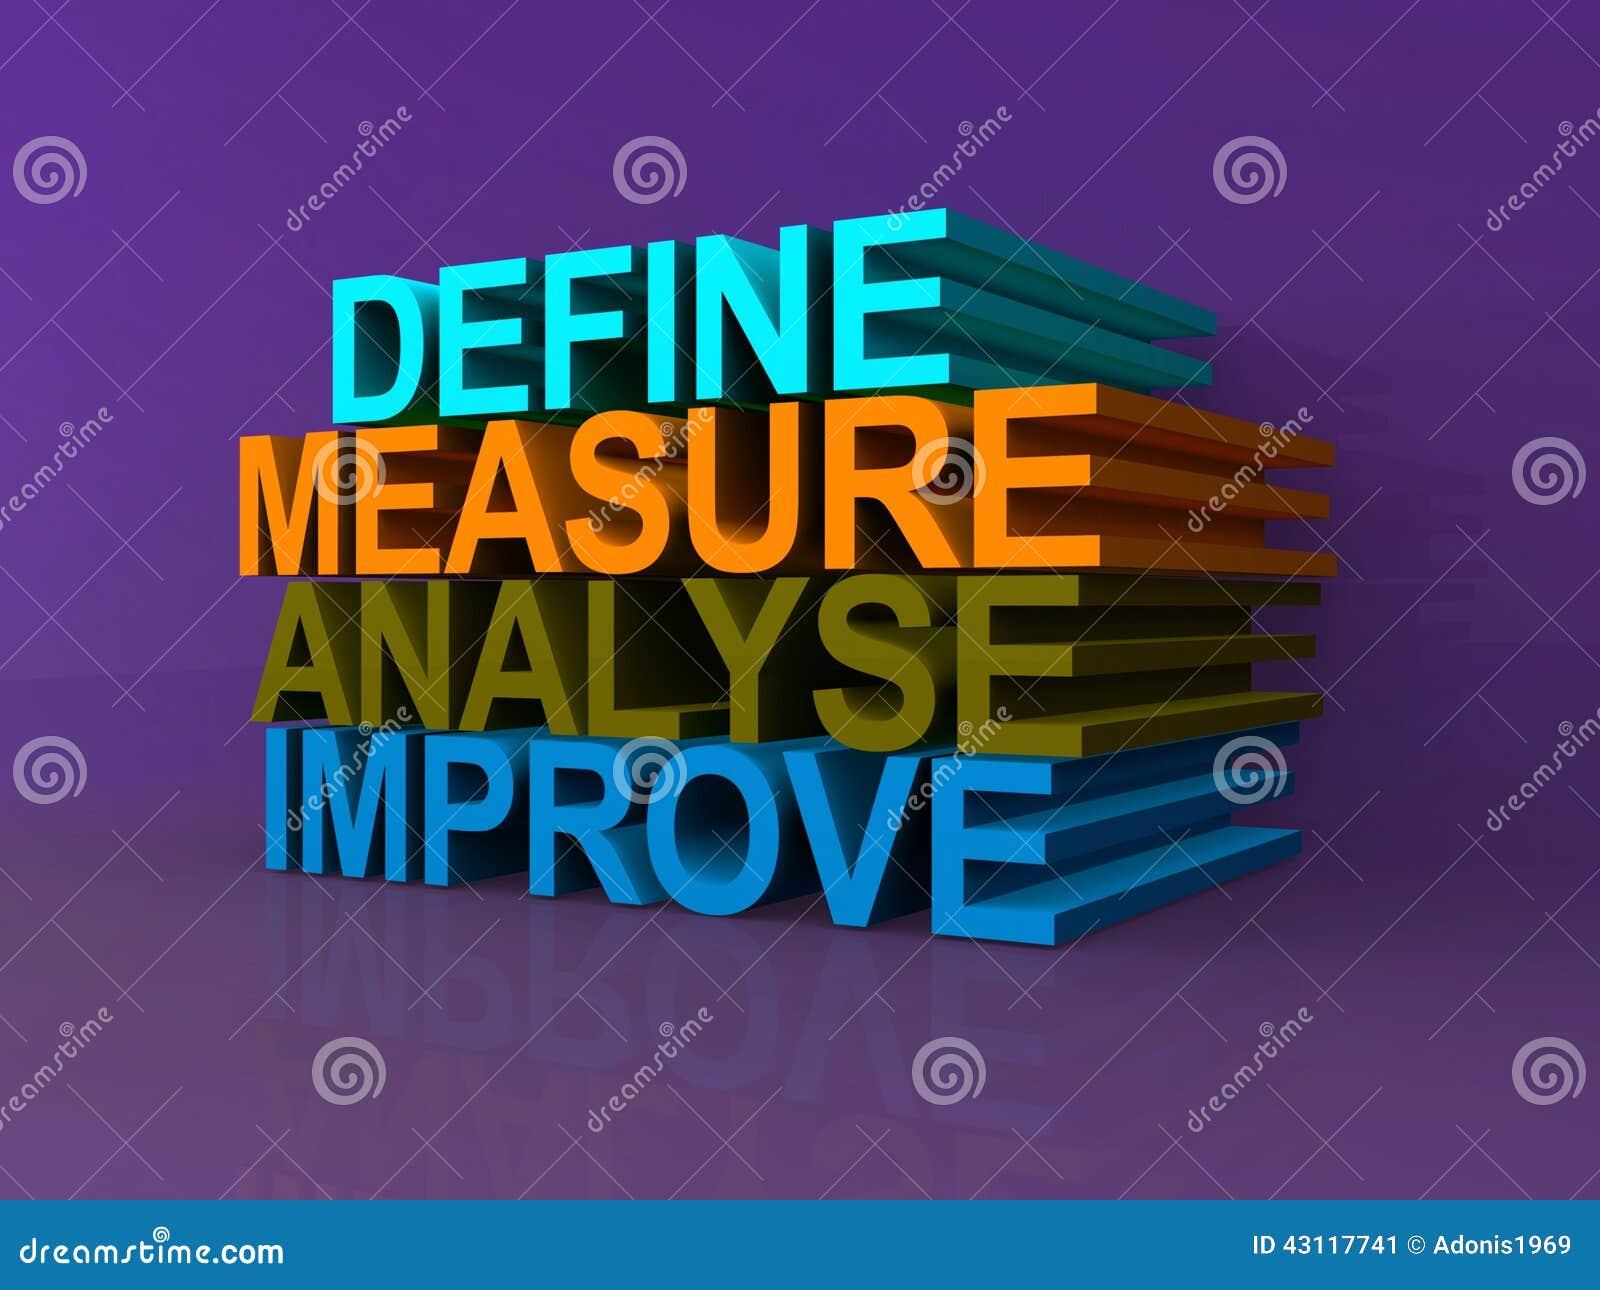 Define measure analyse improve